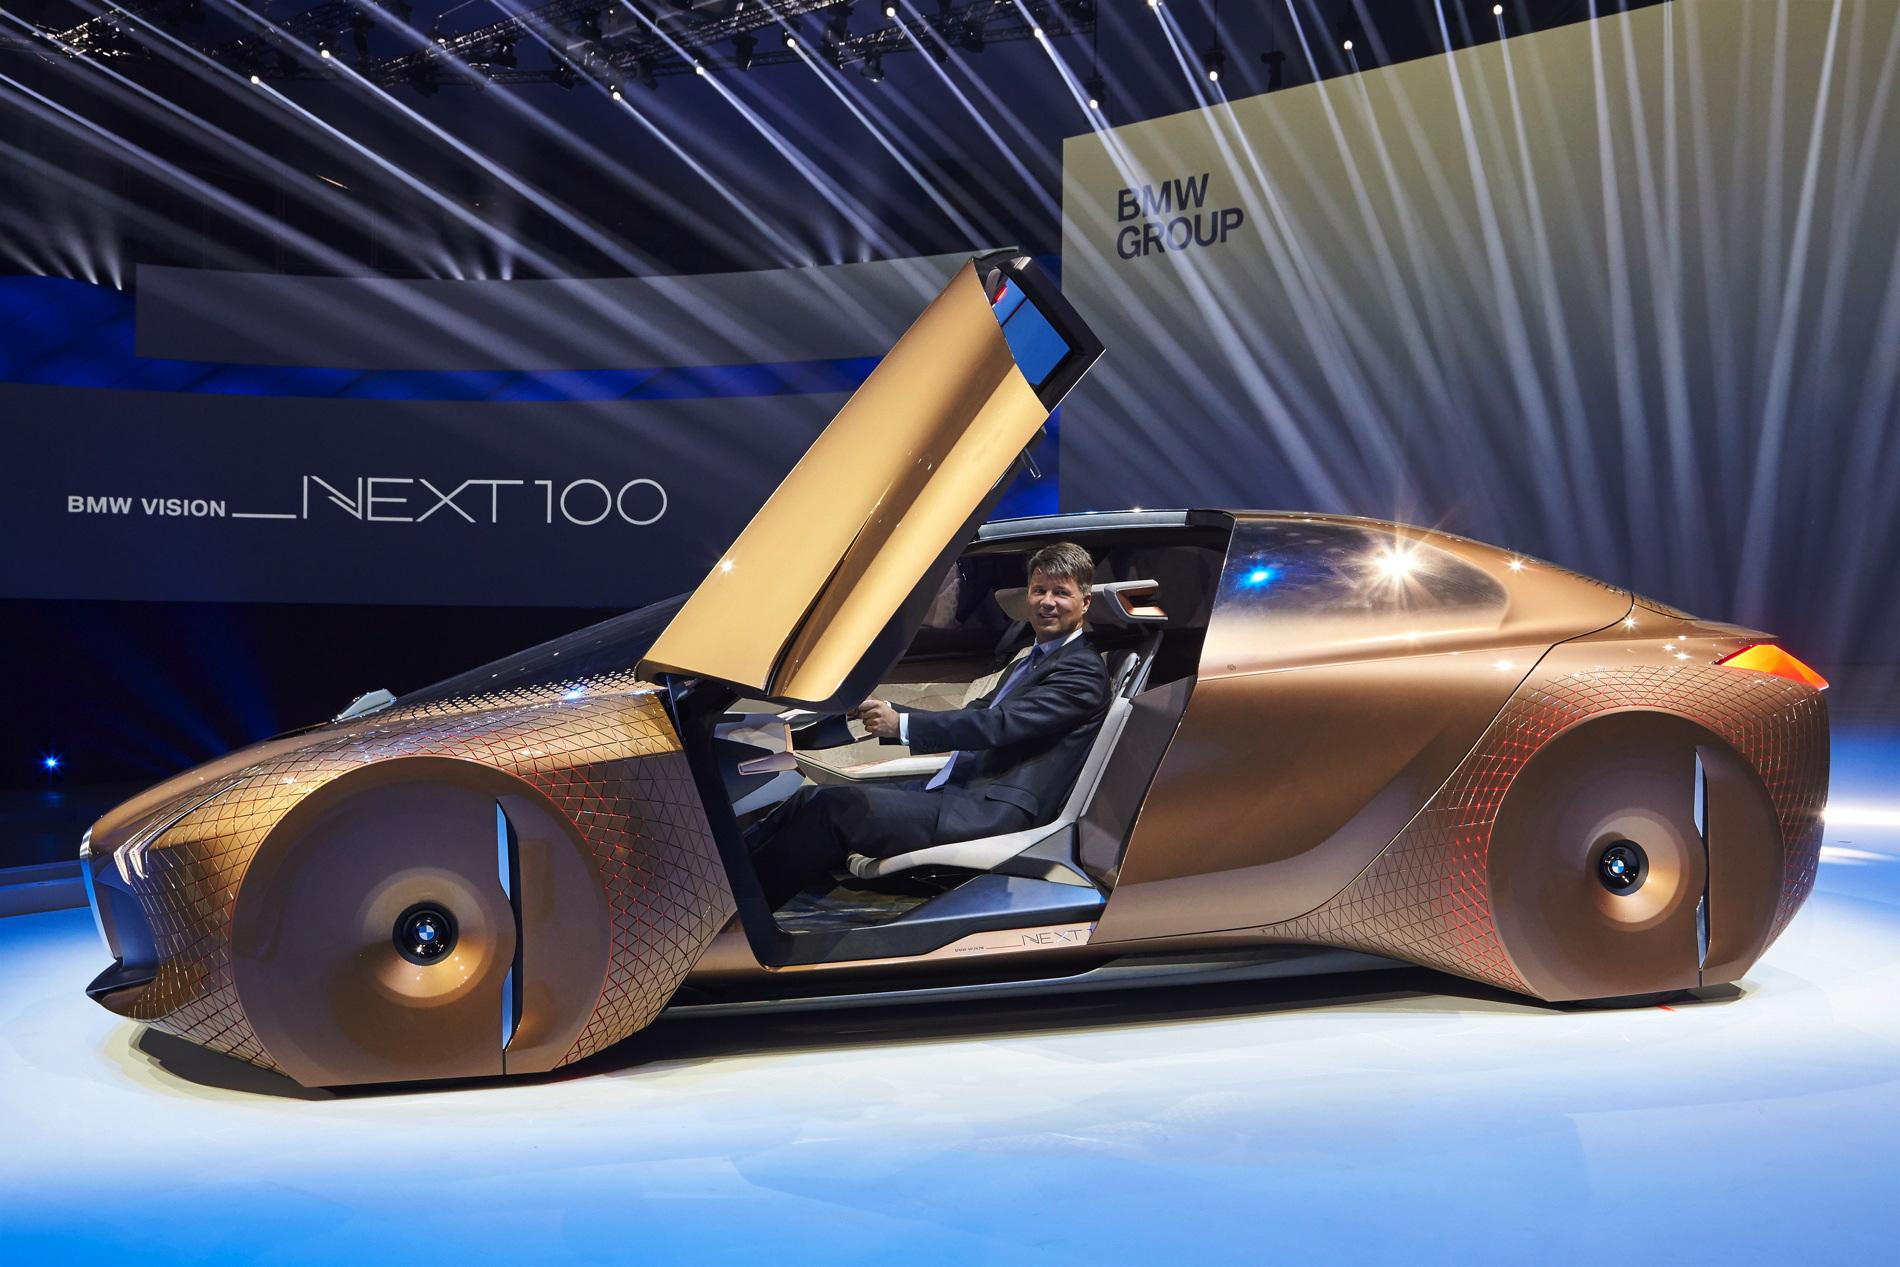 BMW VISION NEXT 100 images 31